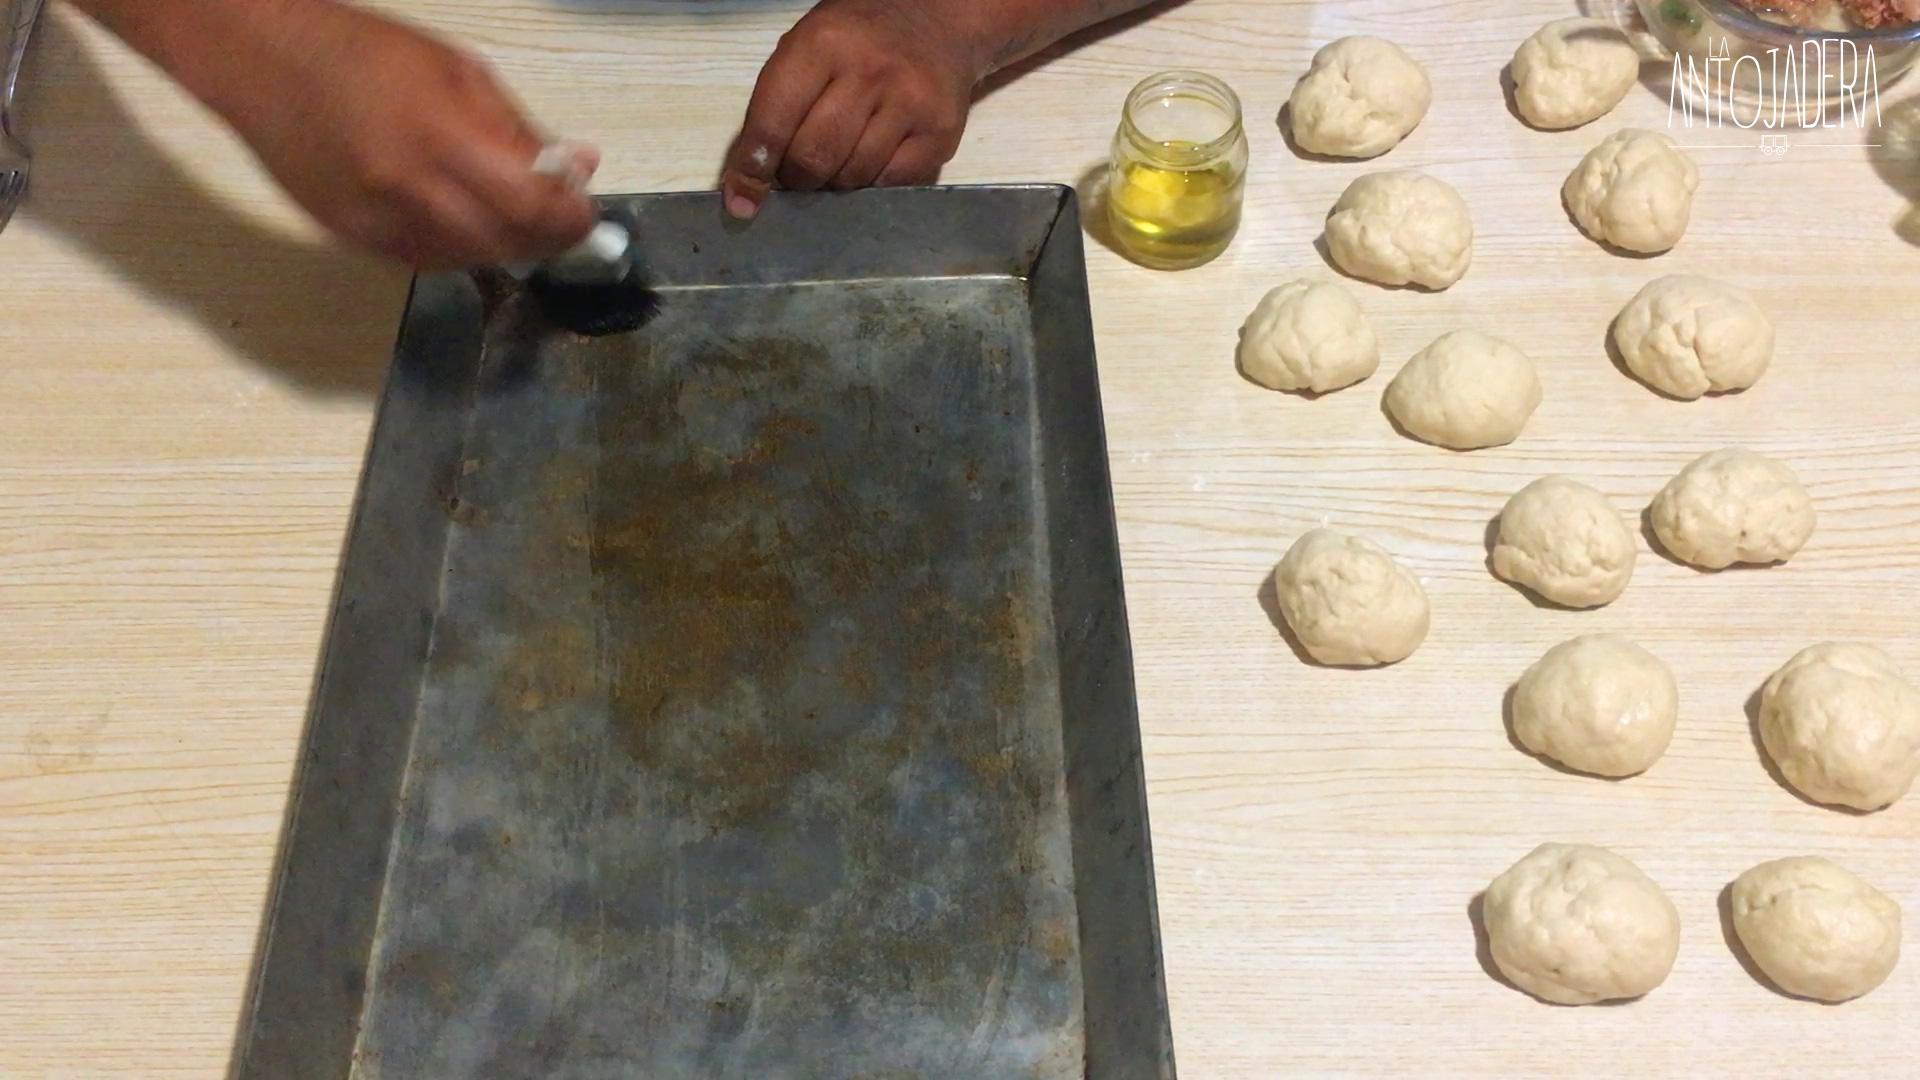 La Antojadera | Empanada Frita